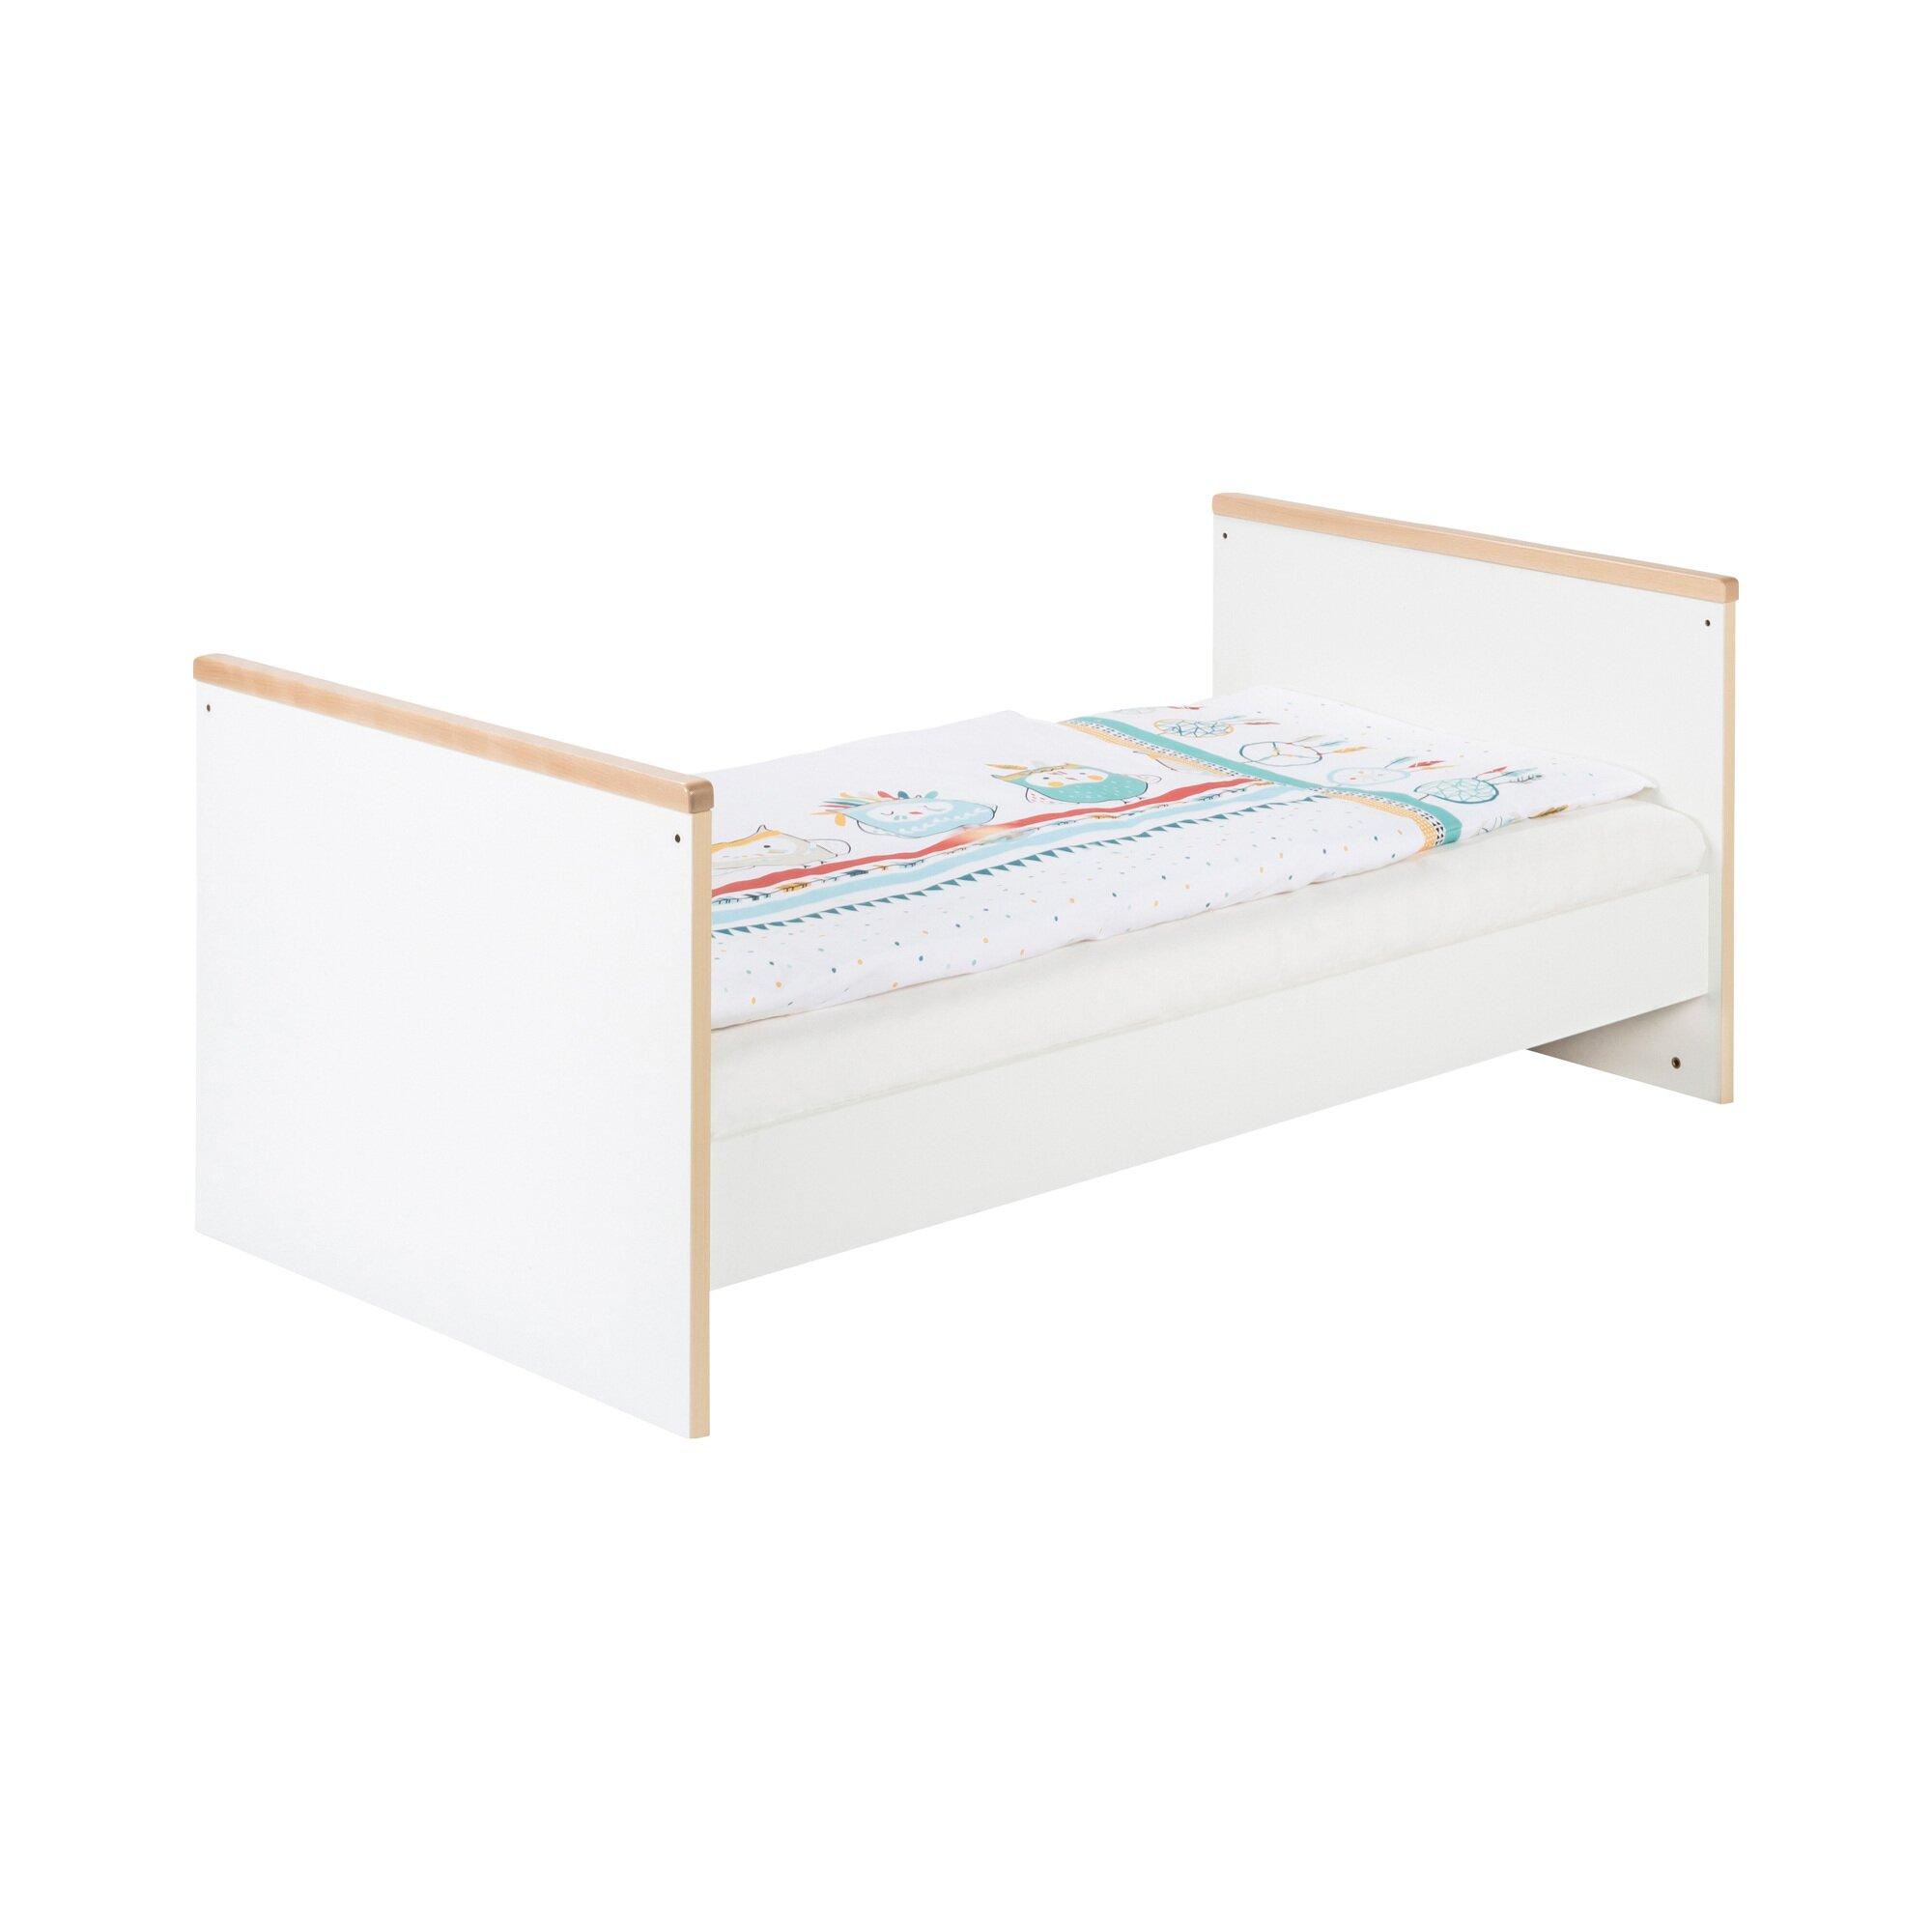 schardt-babybett-tokio-70x140-cm